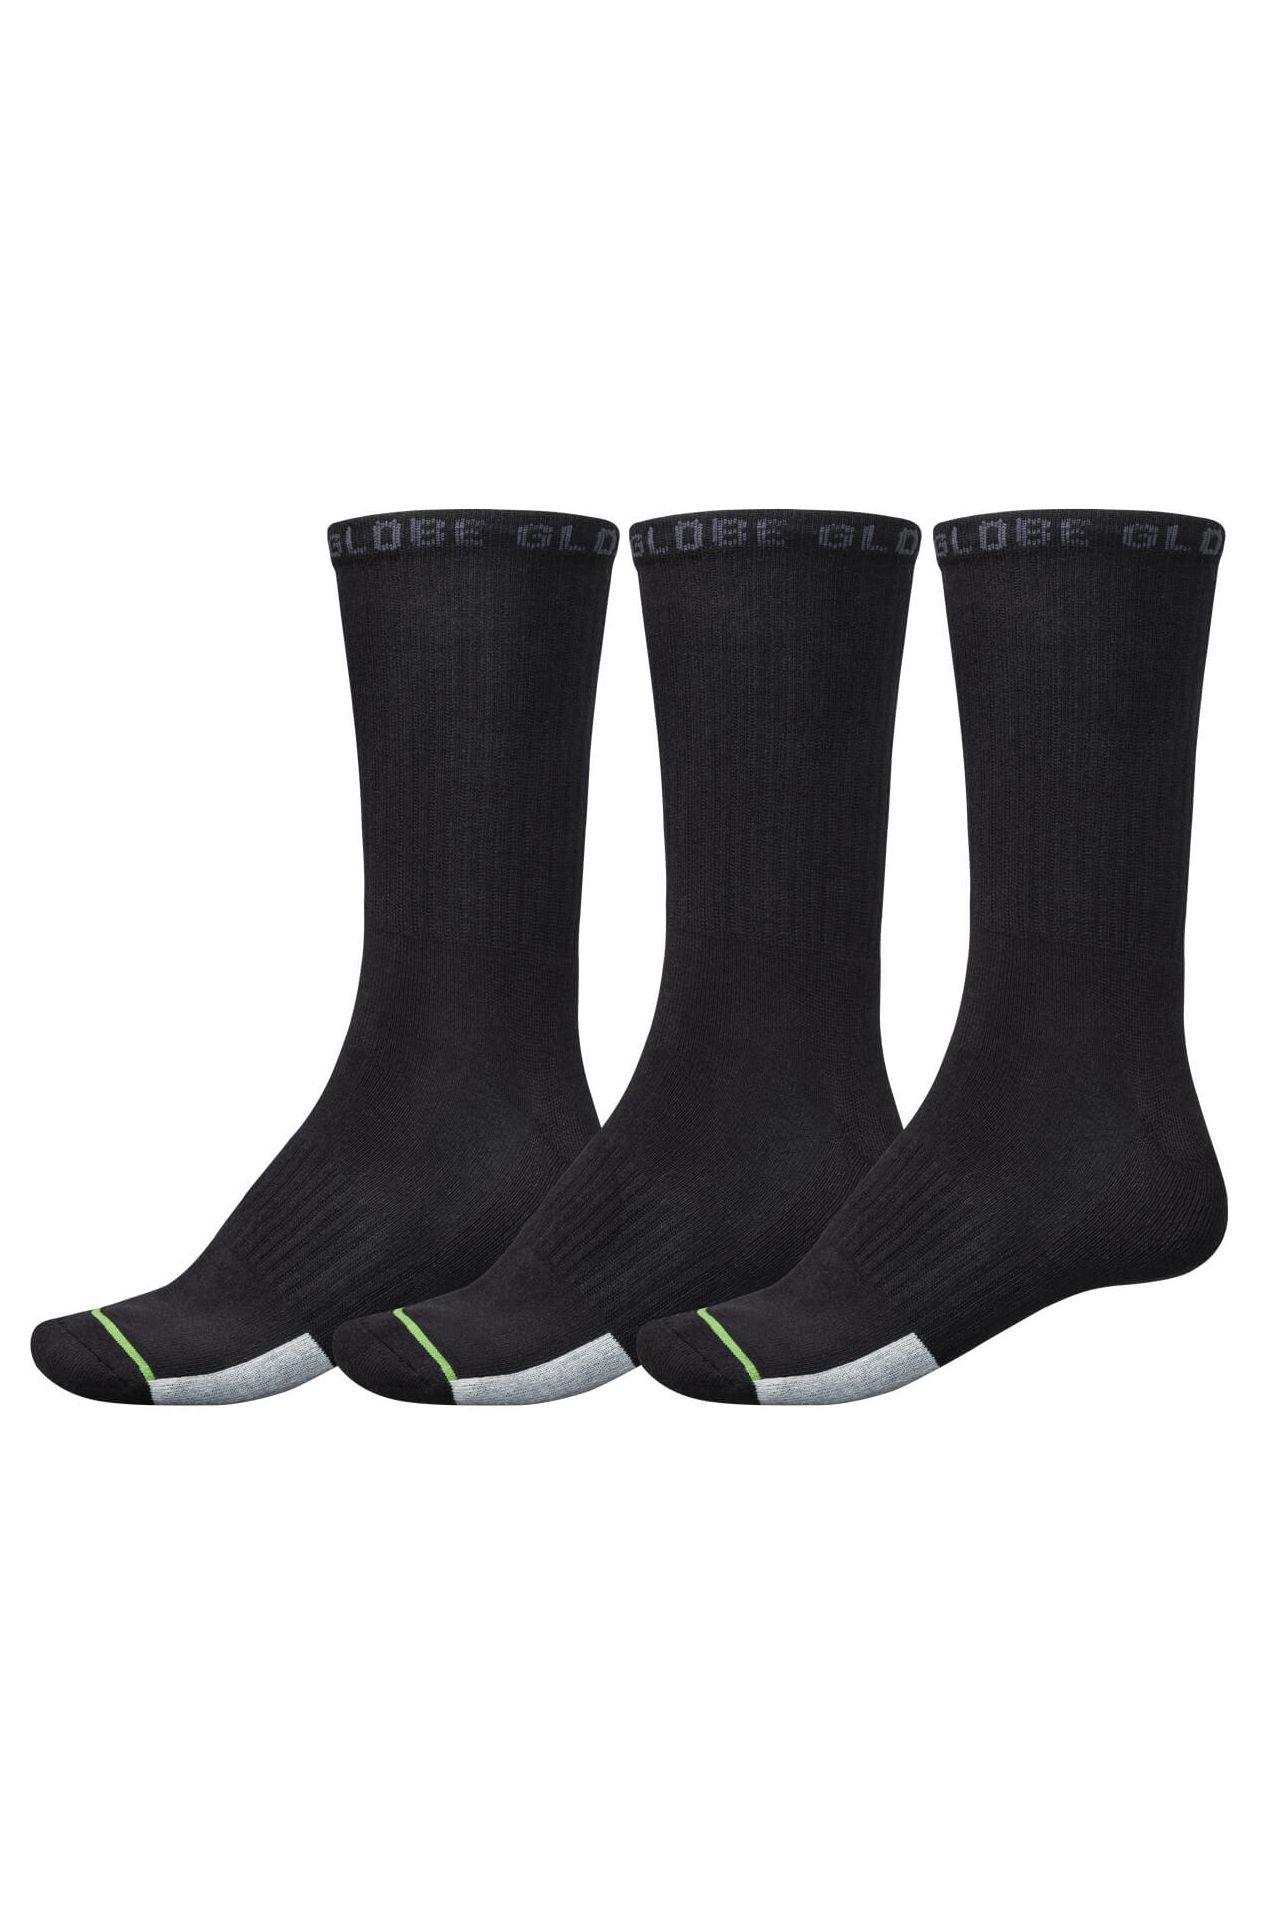 Globe Socks LOW IMPACT CREW SOCK 3 PACK Assorted